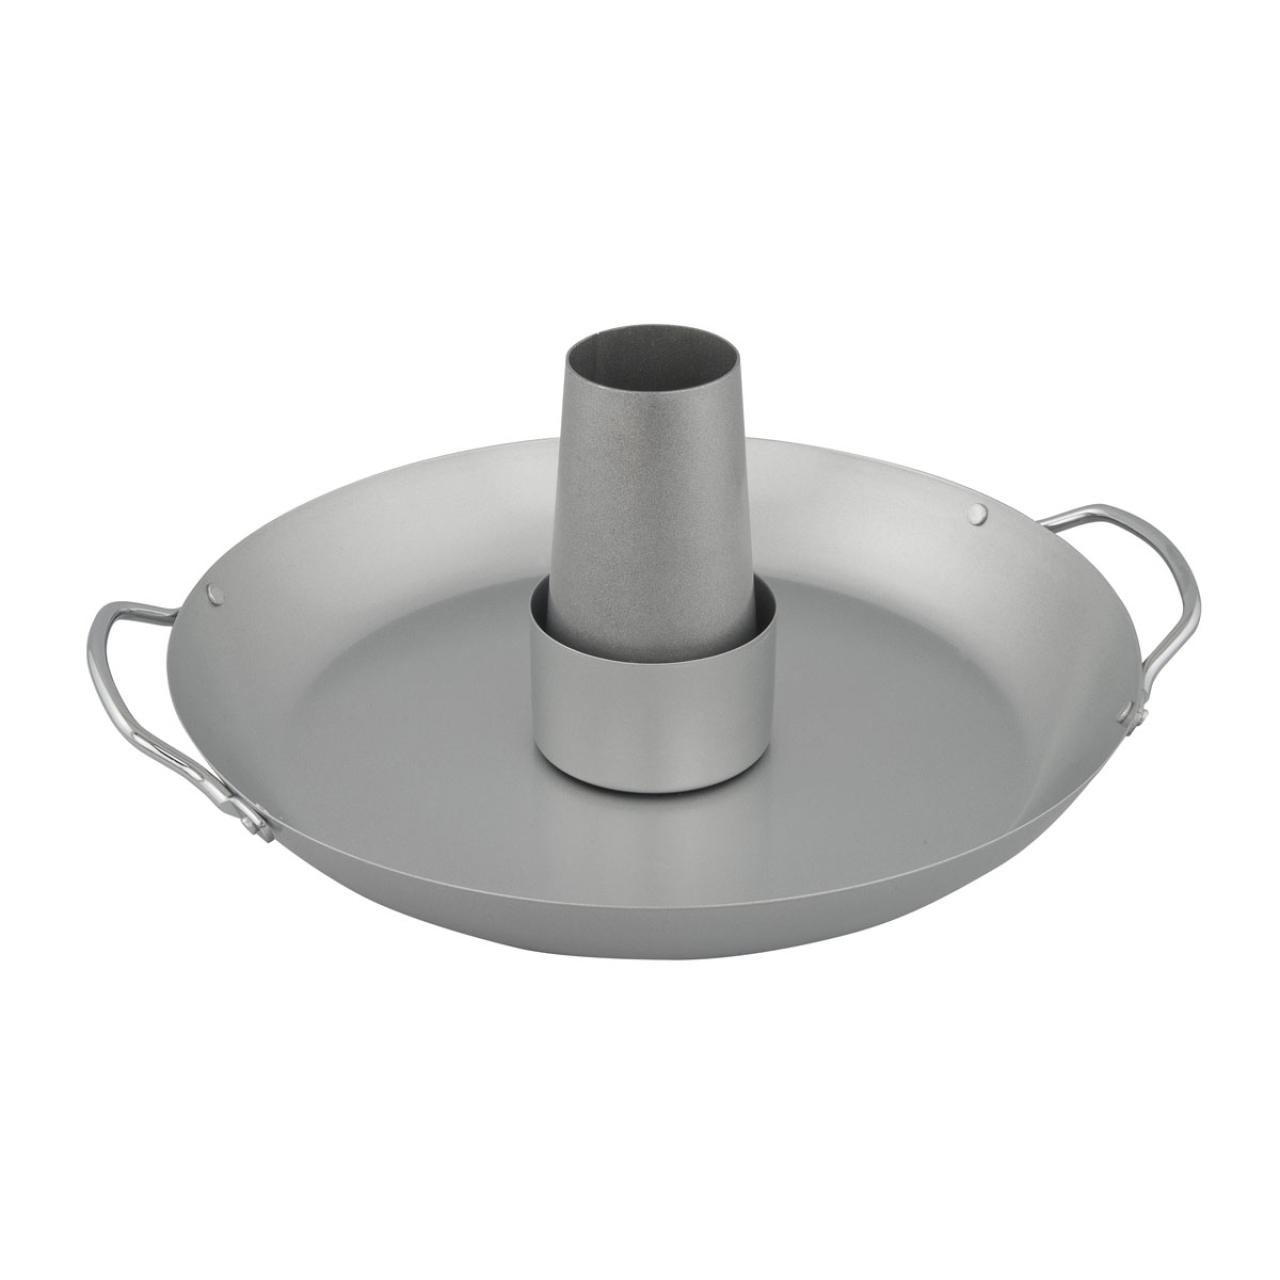 Culinary Modular Hähnchenbräter